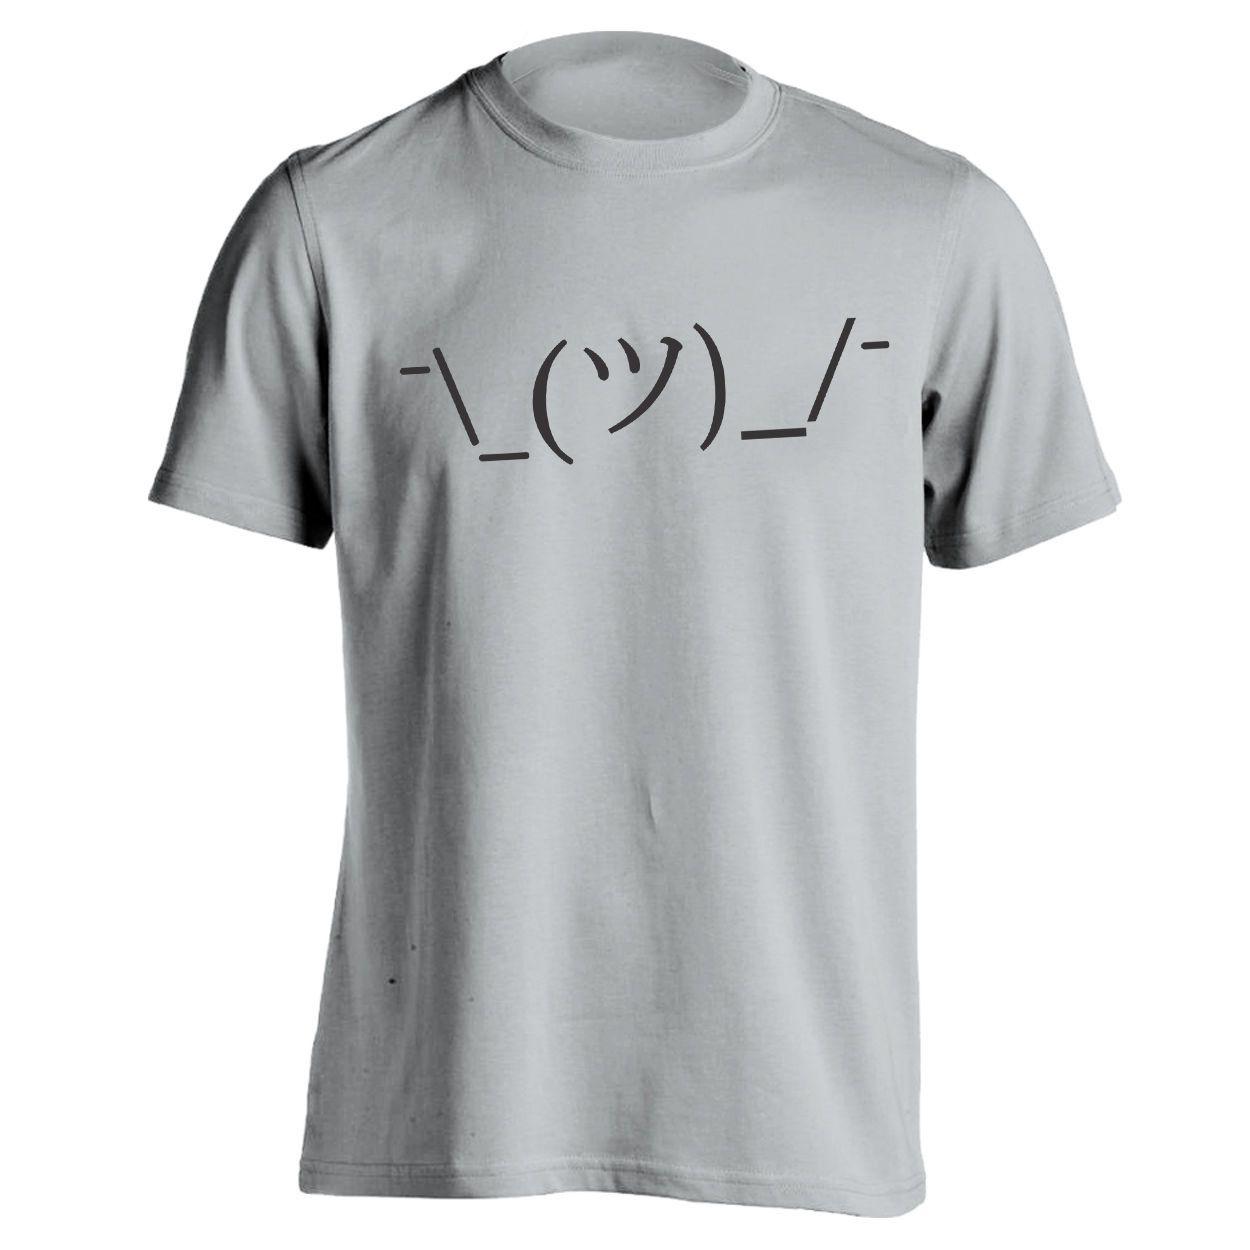 Shrug Lol Idk Face Funny  Internet  Meme  Geek Gray Basic Men/'s T-Shirt